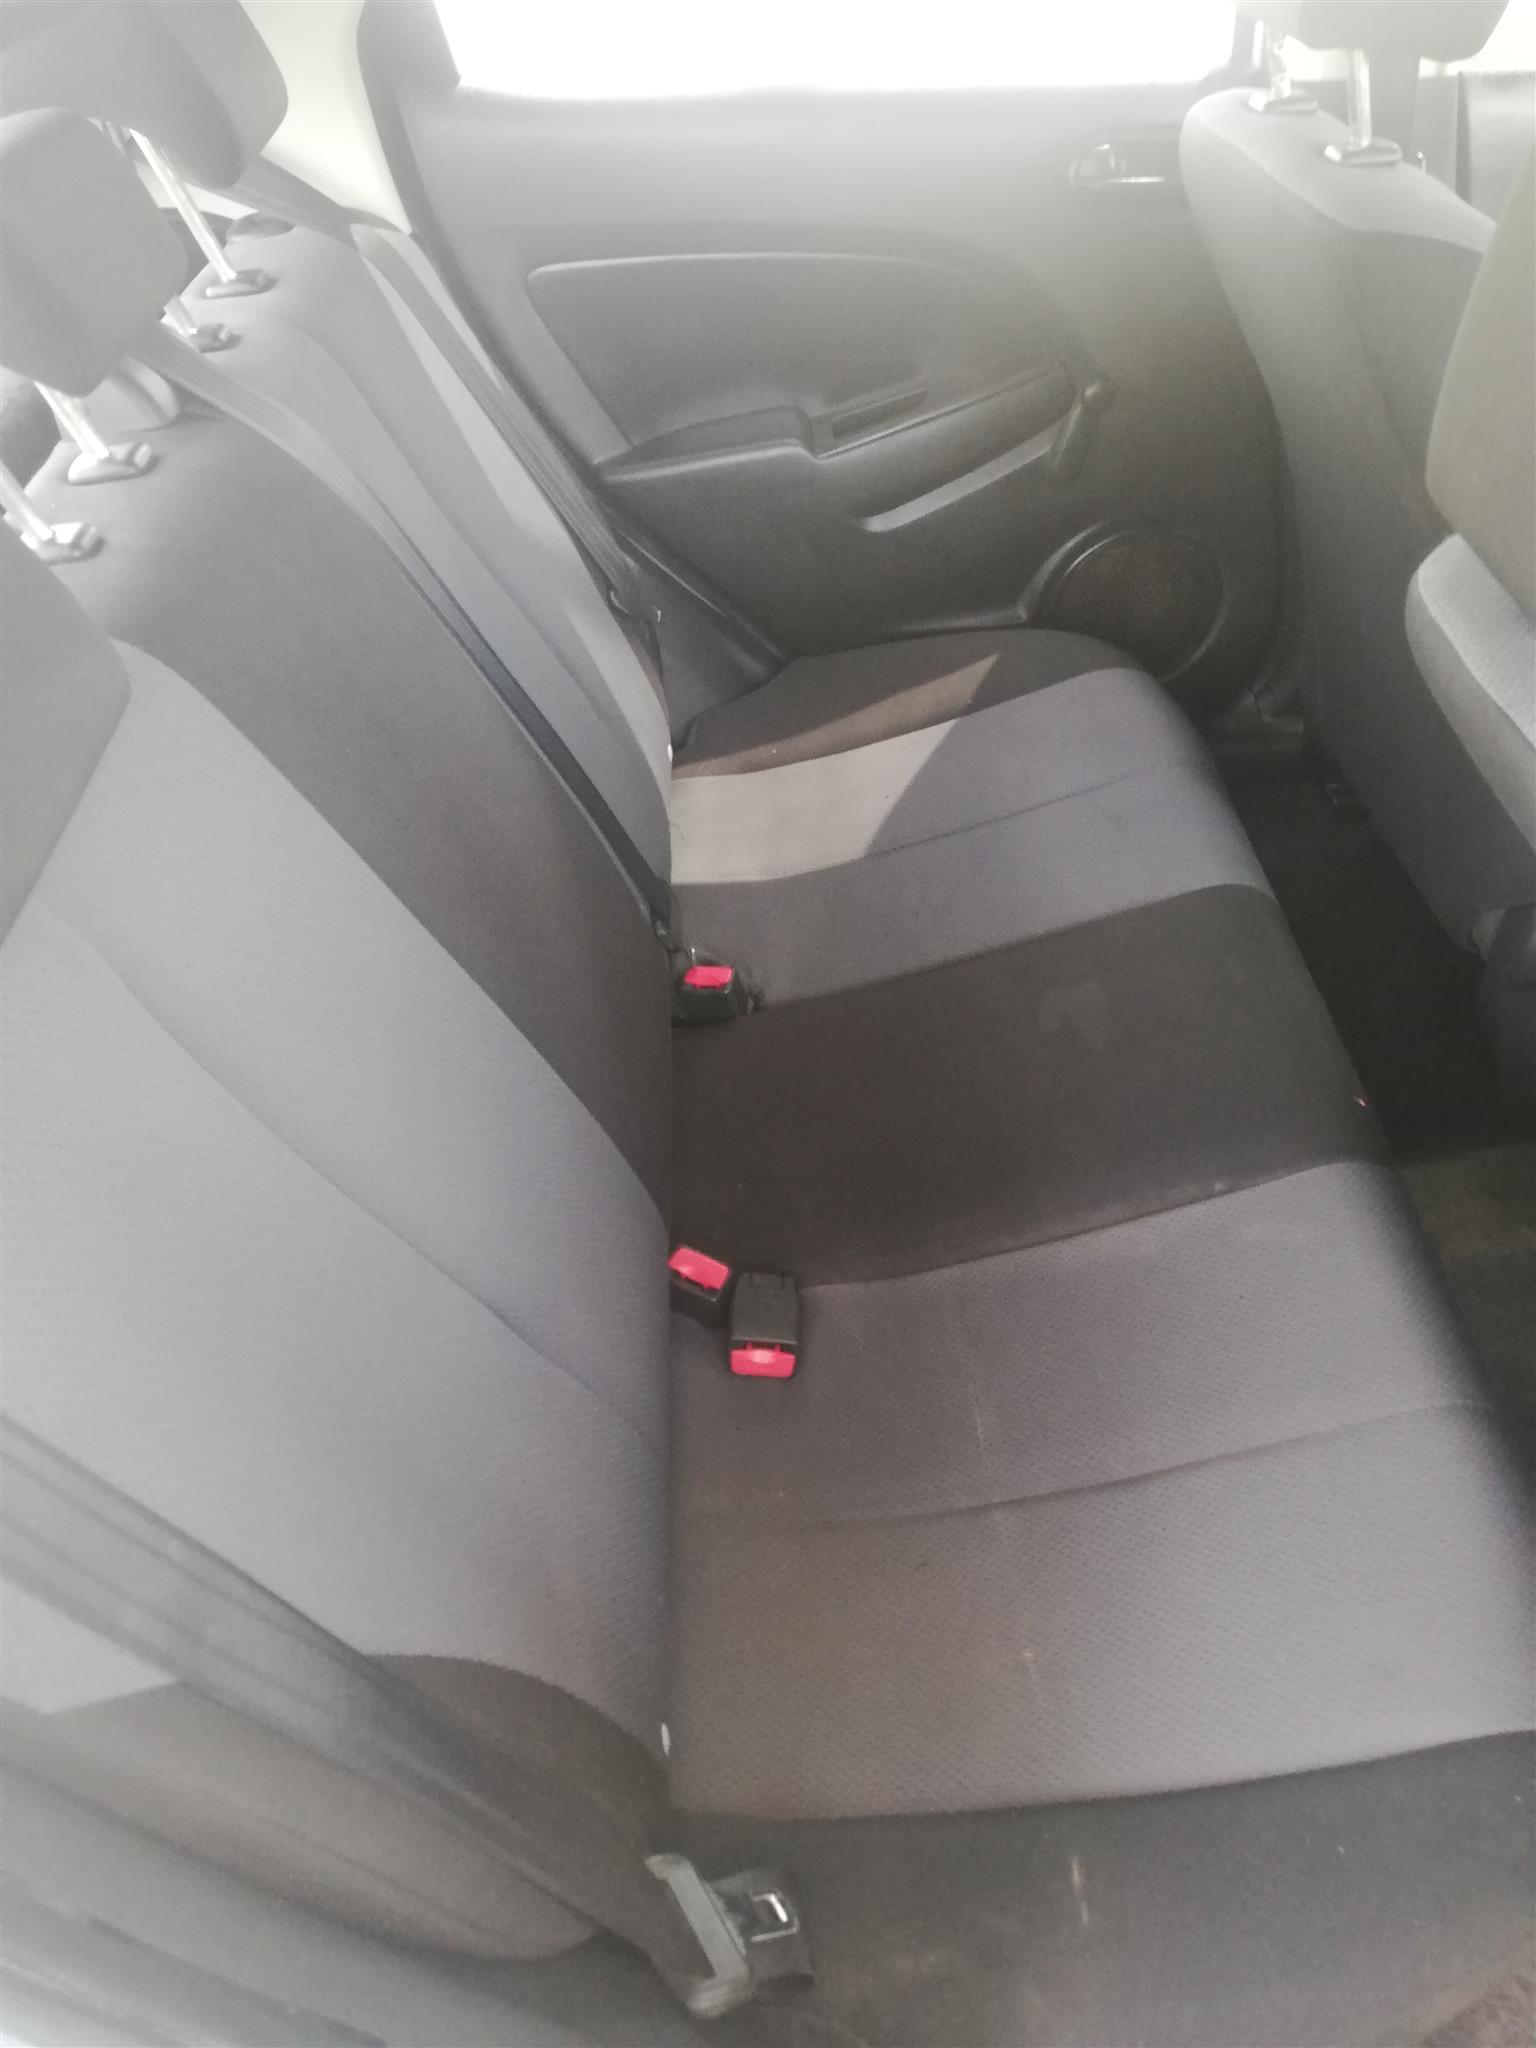 2010 Mazda 2 Mazda hatch 1.3 Active